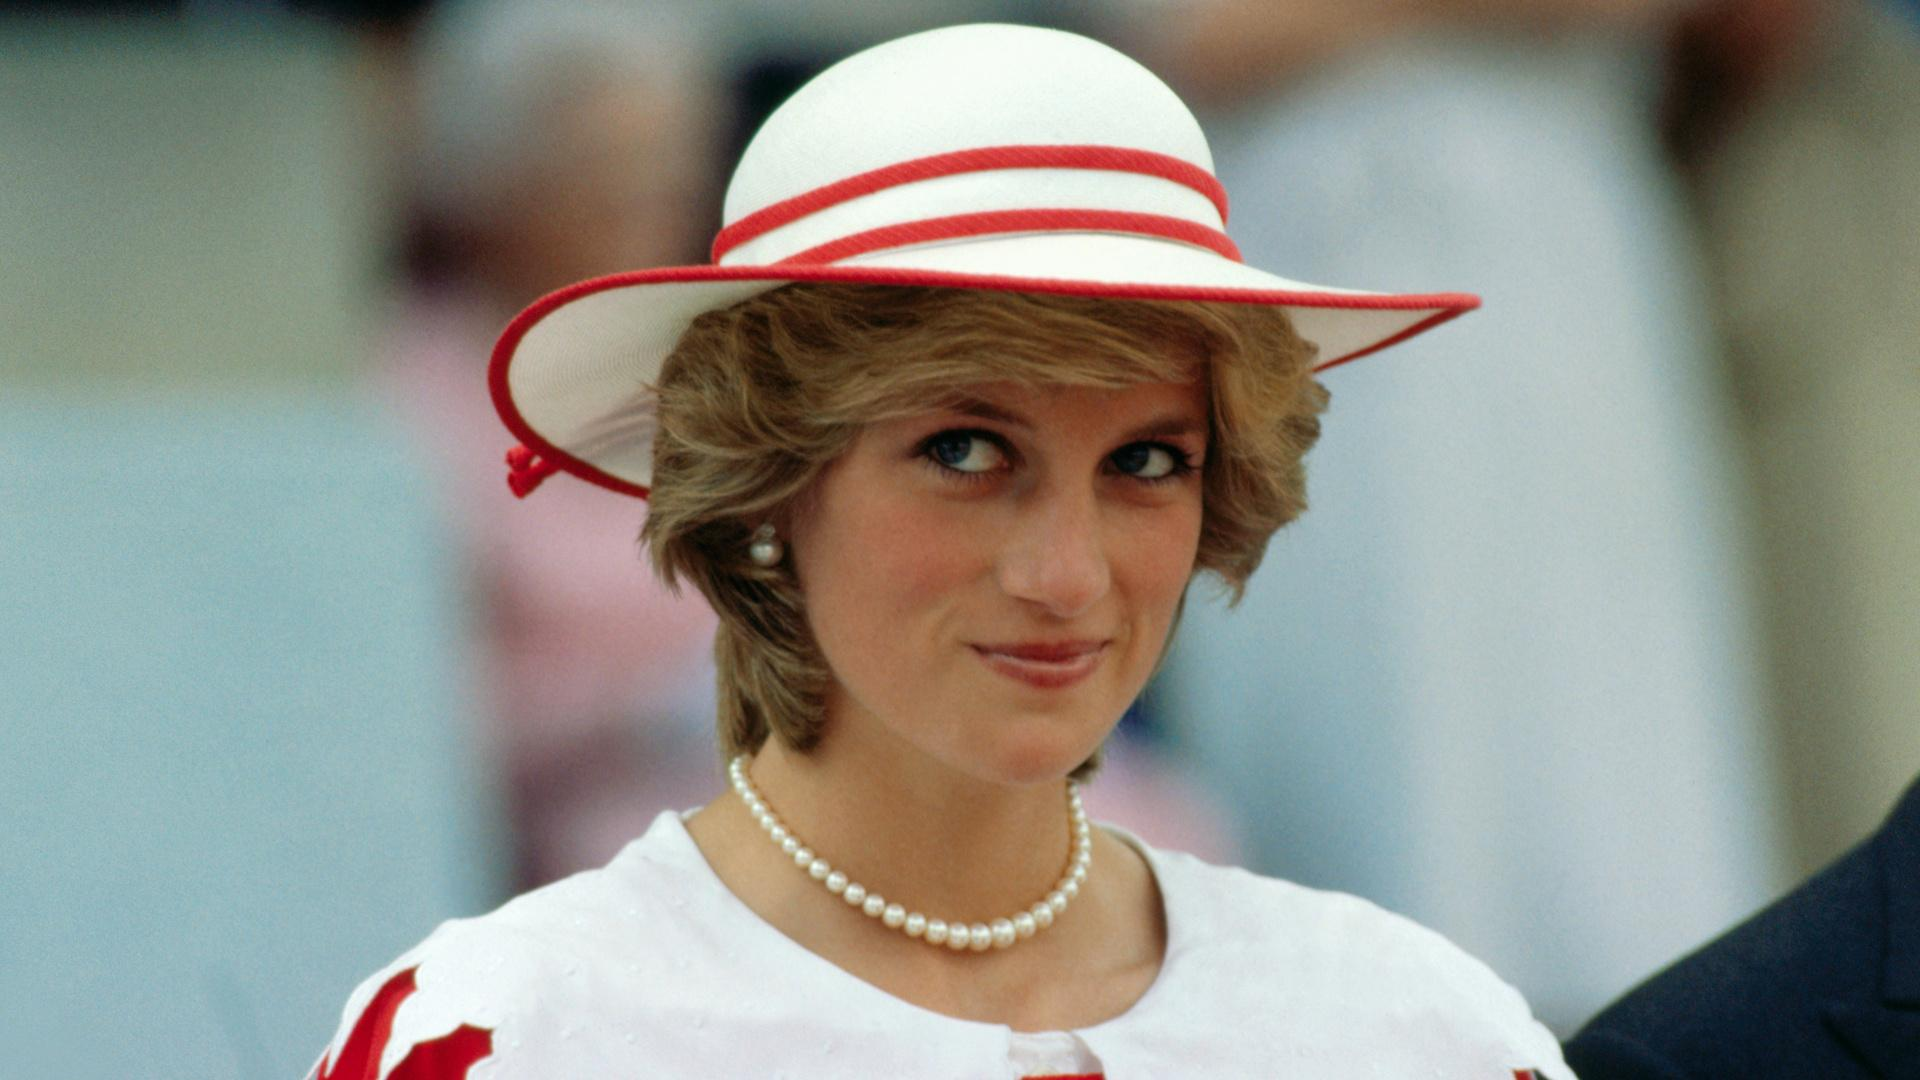 A Timeline of Princess Diana's Final Months